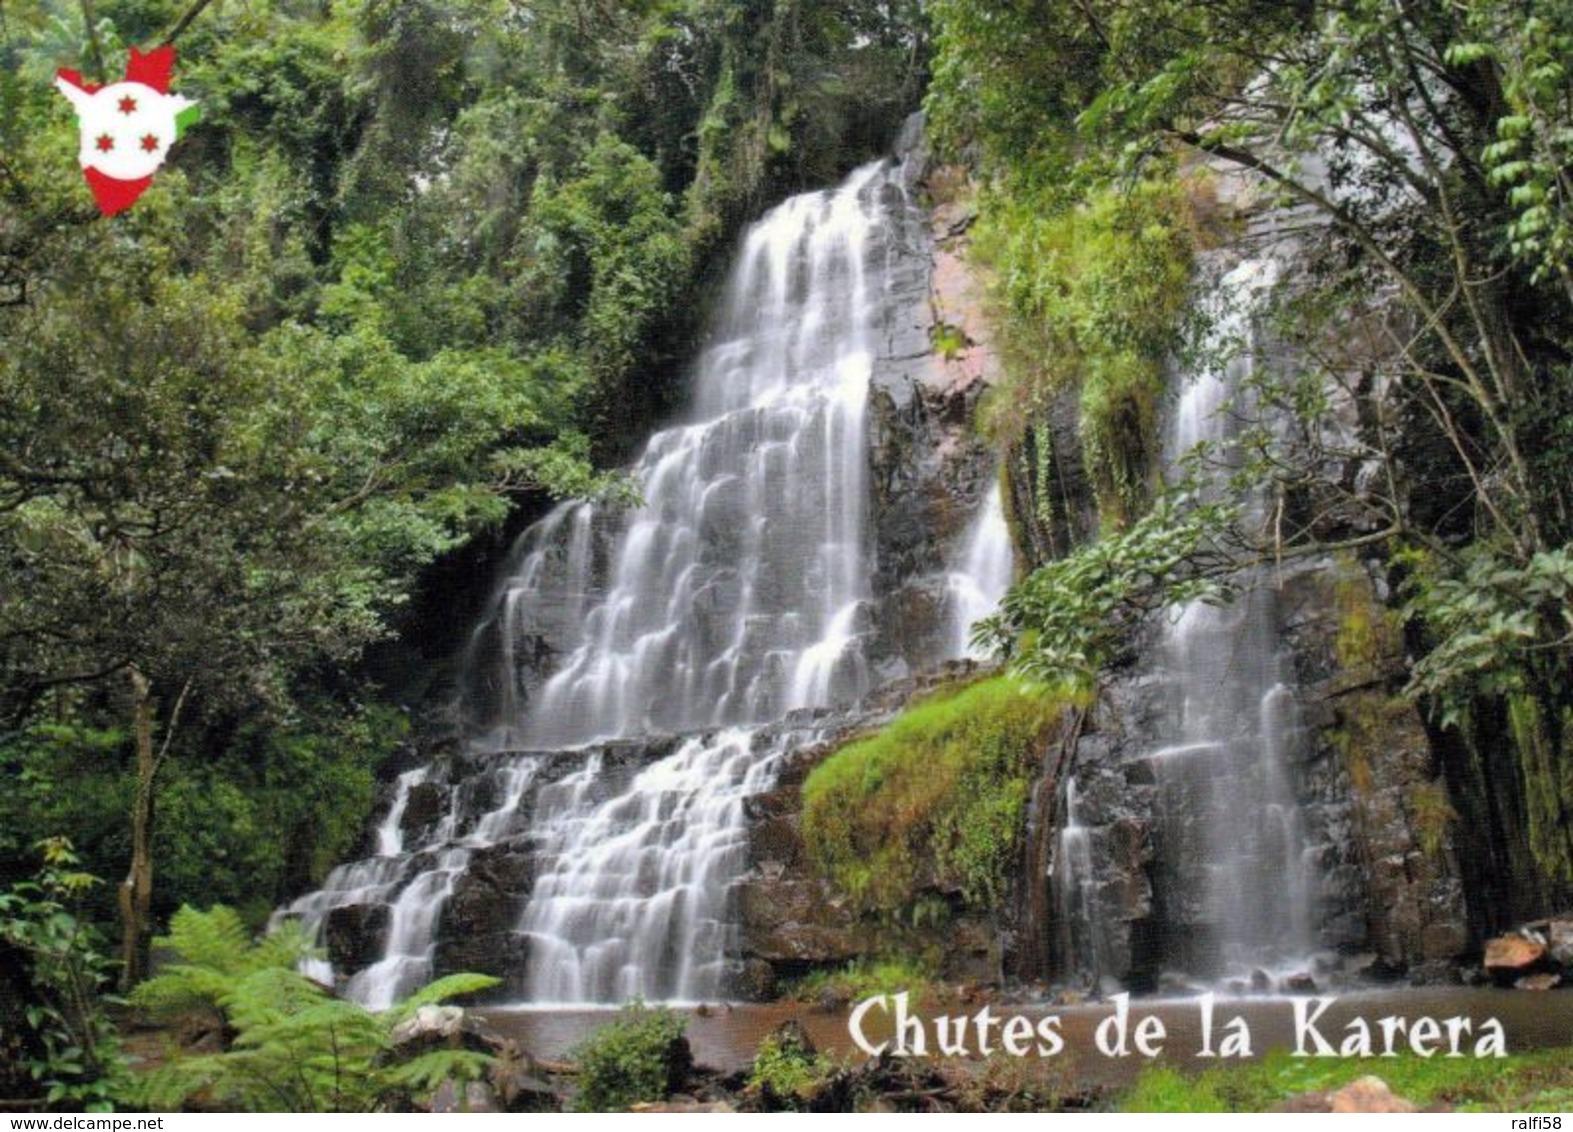 1 AK Burundi * Wasserfall Karera - Chutes De La Karera - Auf Der Tentativliste Von Burundi Für Das UNESCO Weltnaturerbe - Burundi